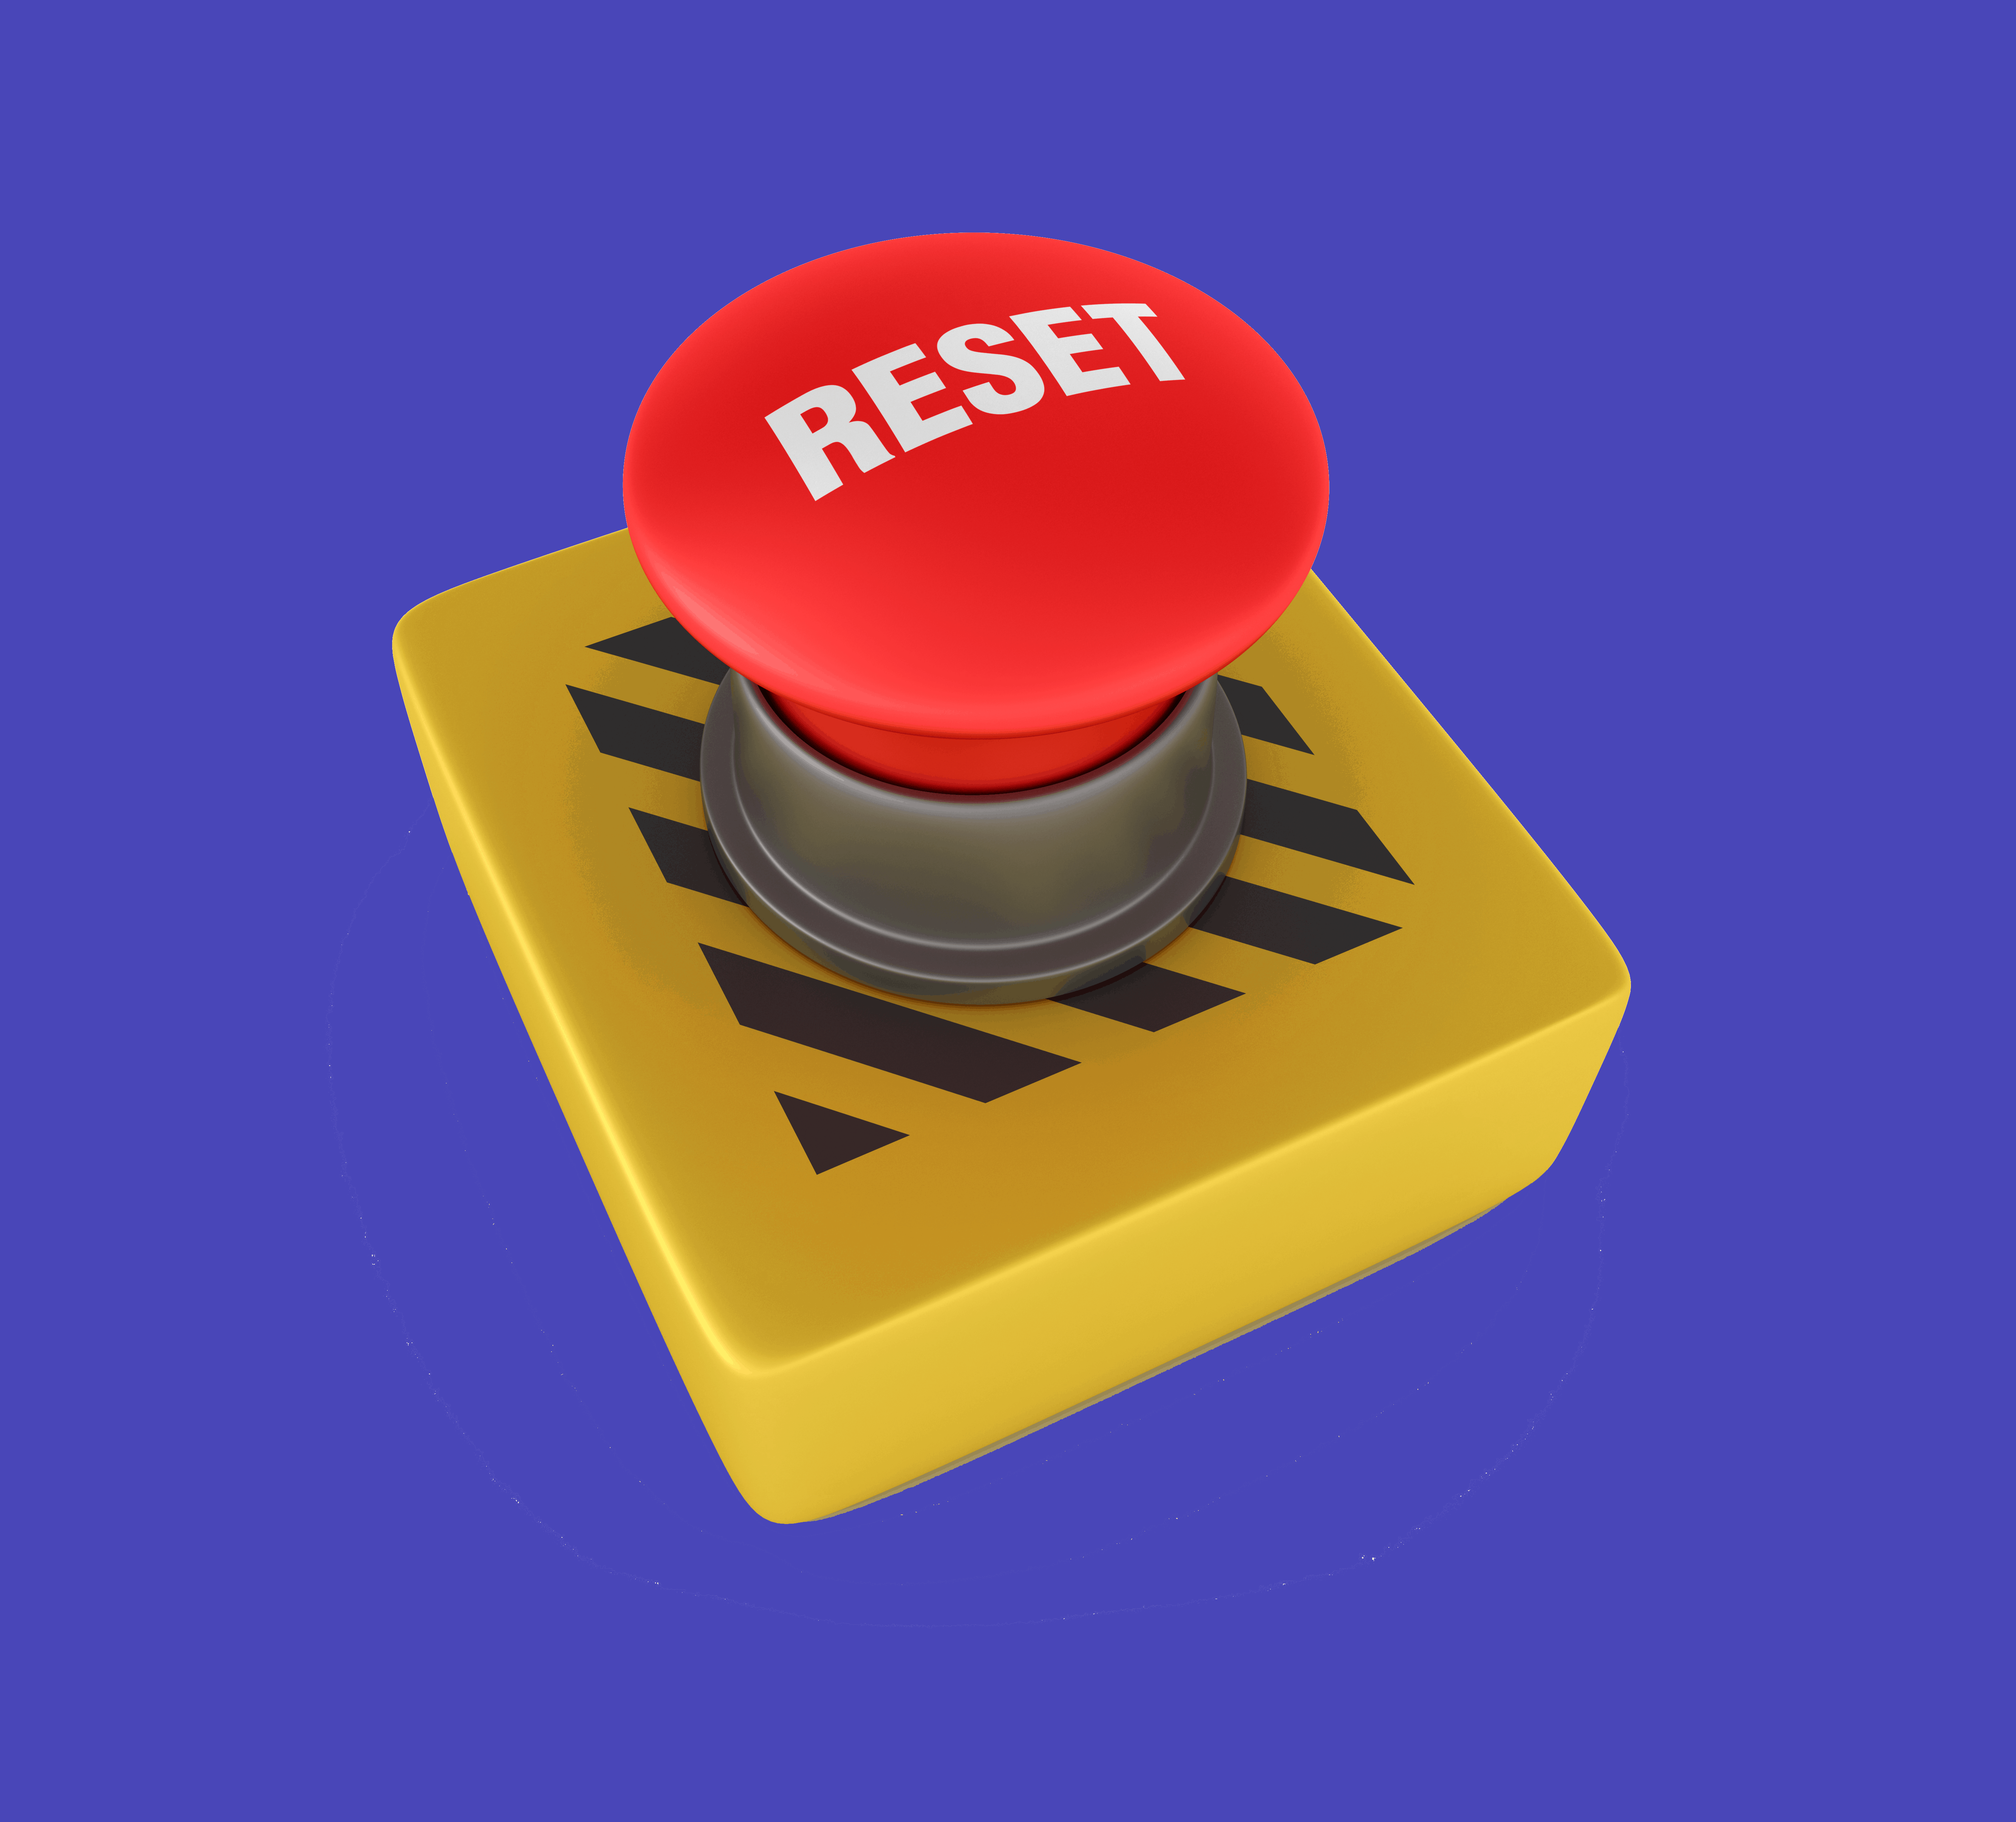 Git HEAD reset main